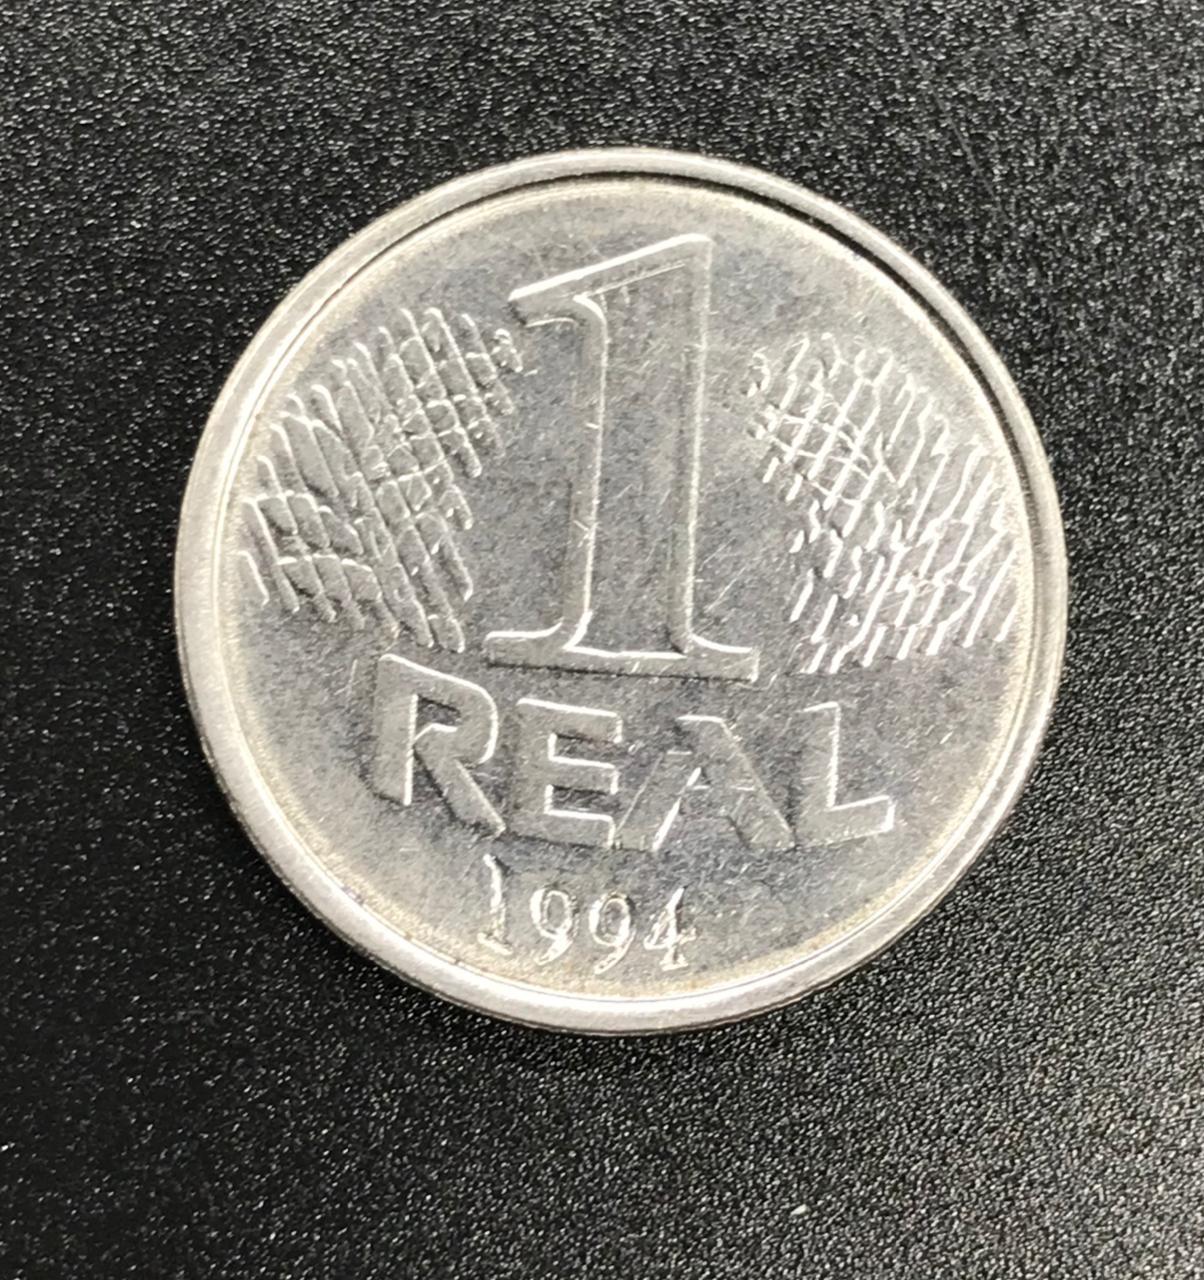 1 REAL 1994 (MBC)